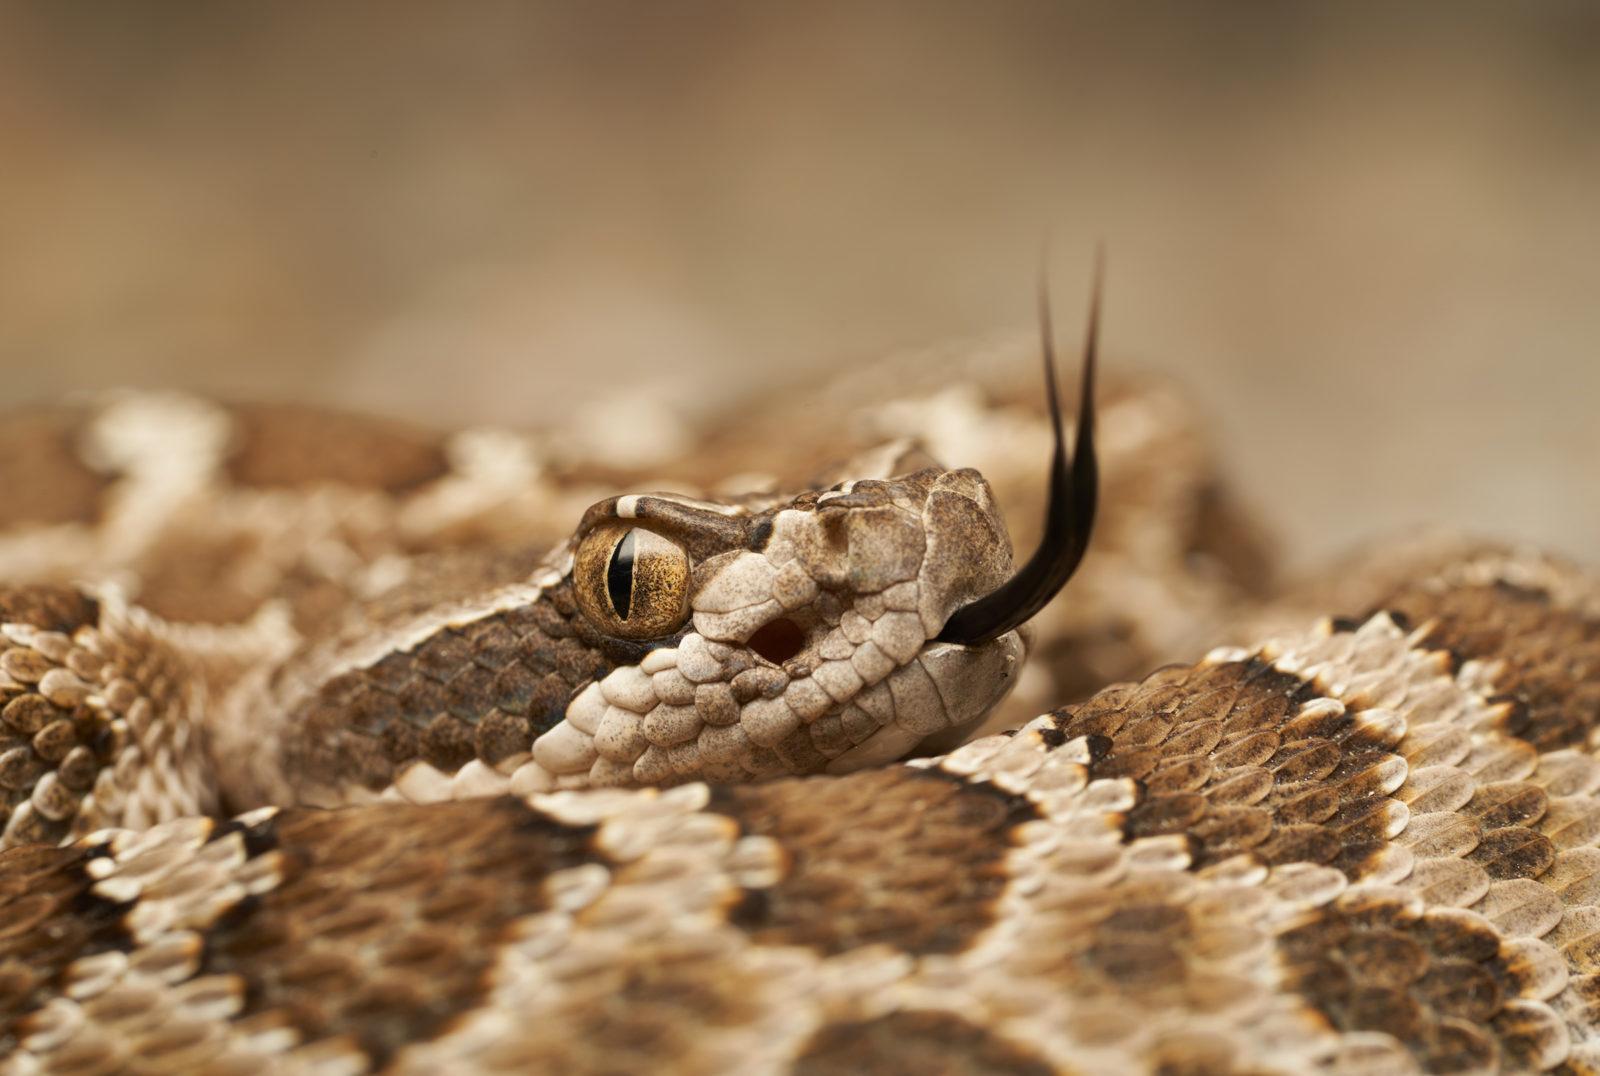 Jenis ular 1